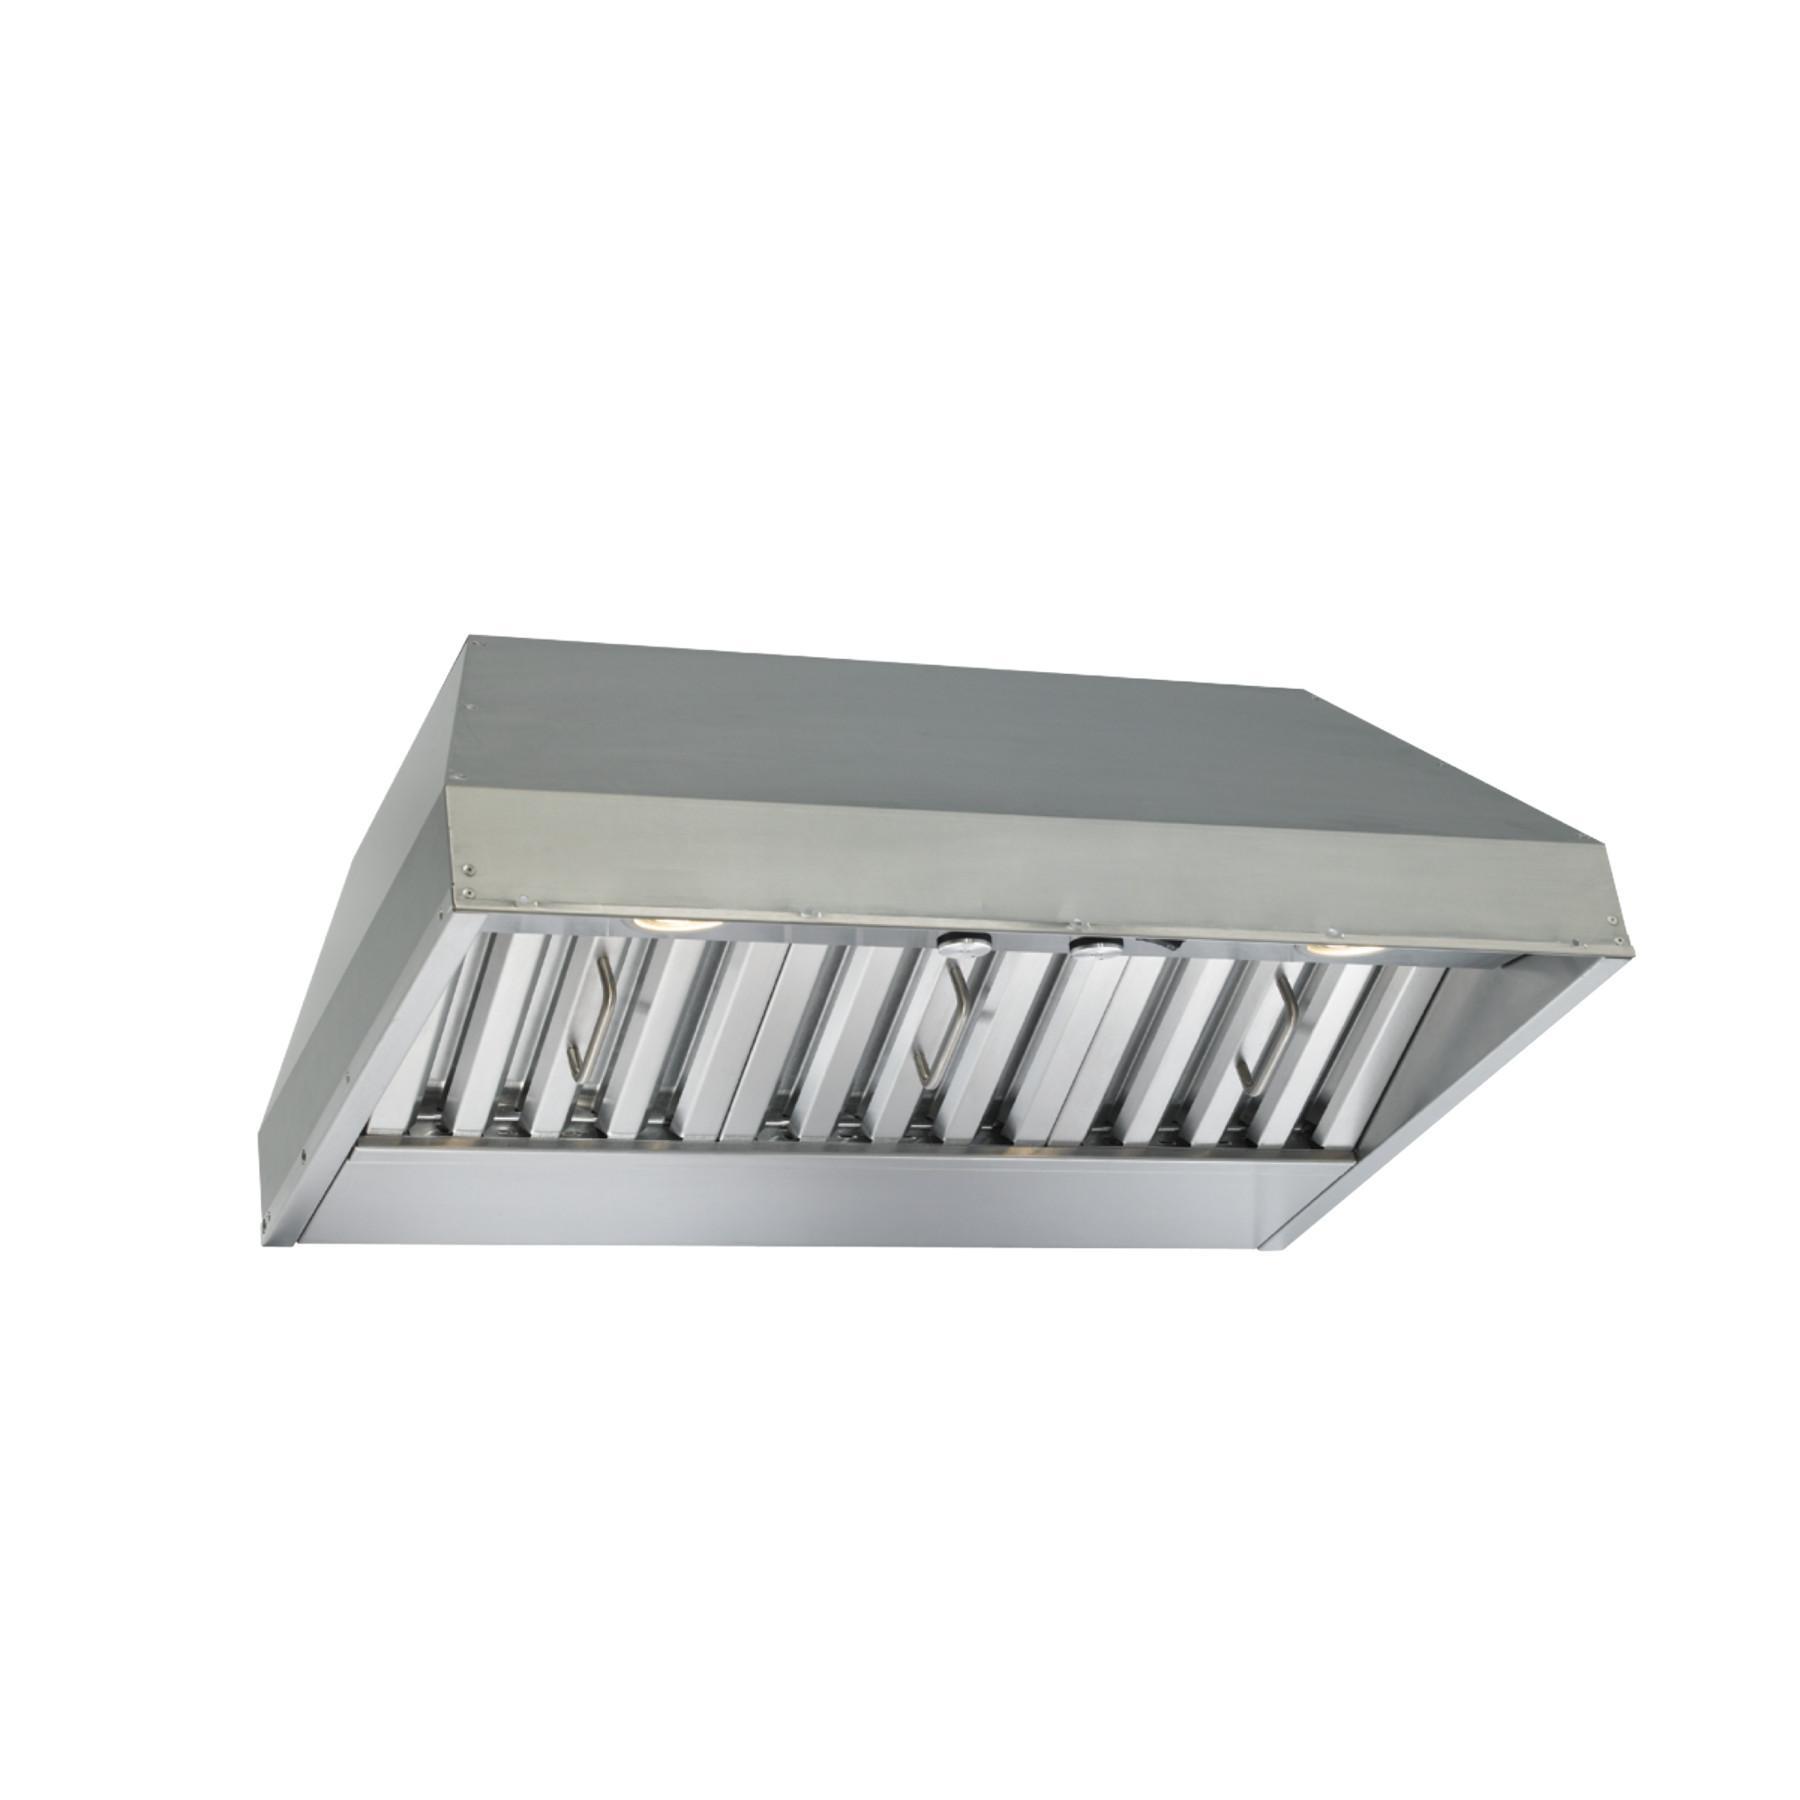 30-inch Built-In Range Hood, 290 Max CFM Blower, Stainless Steel (CP3 Series)